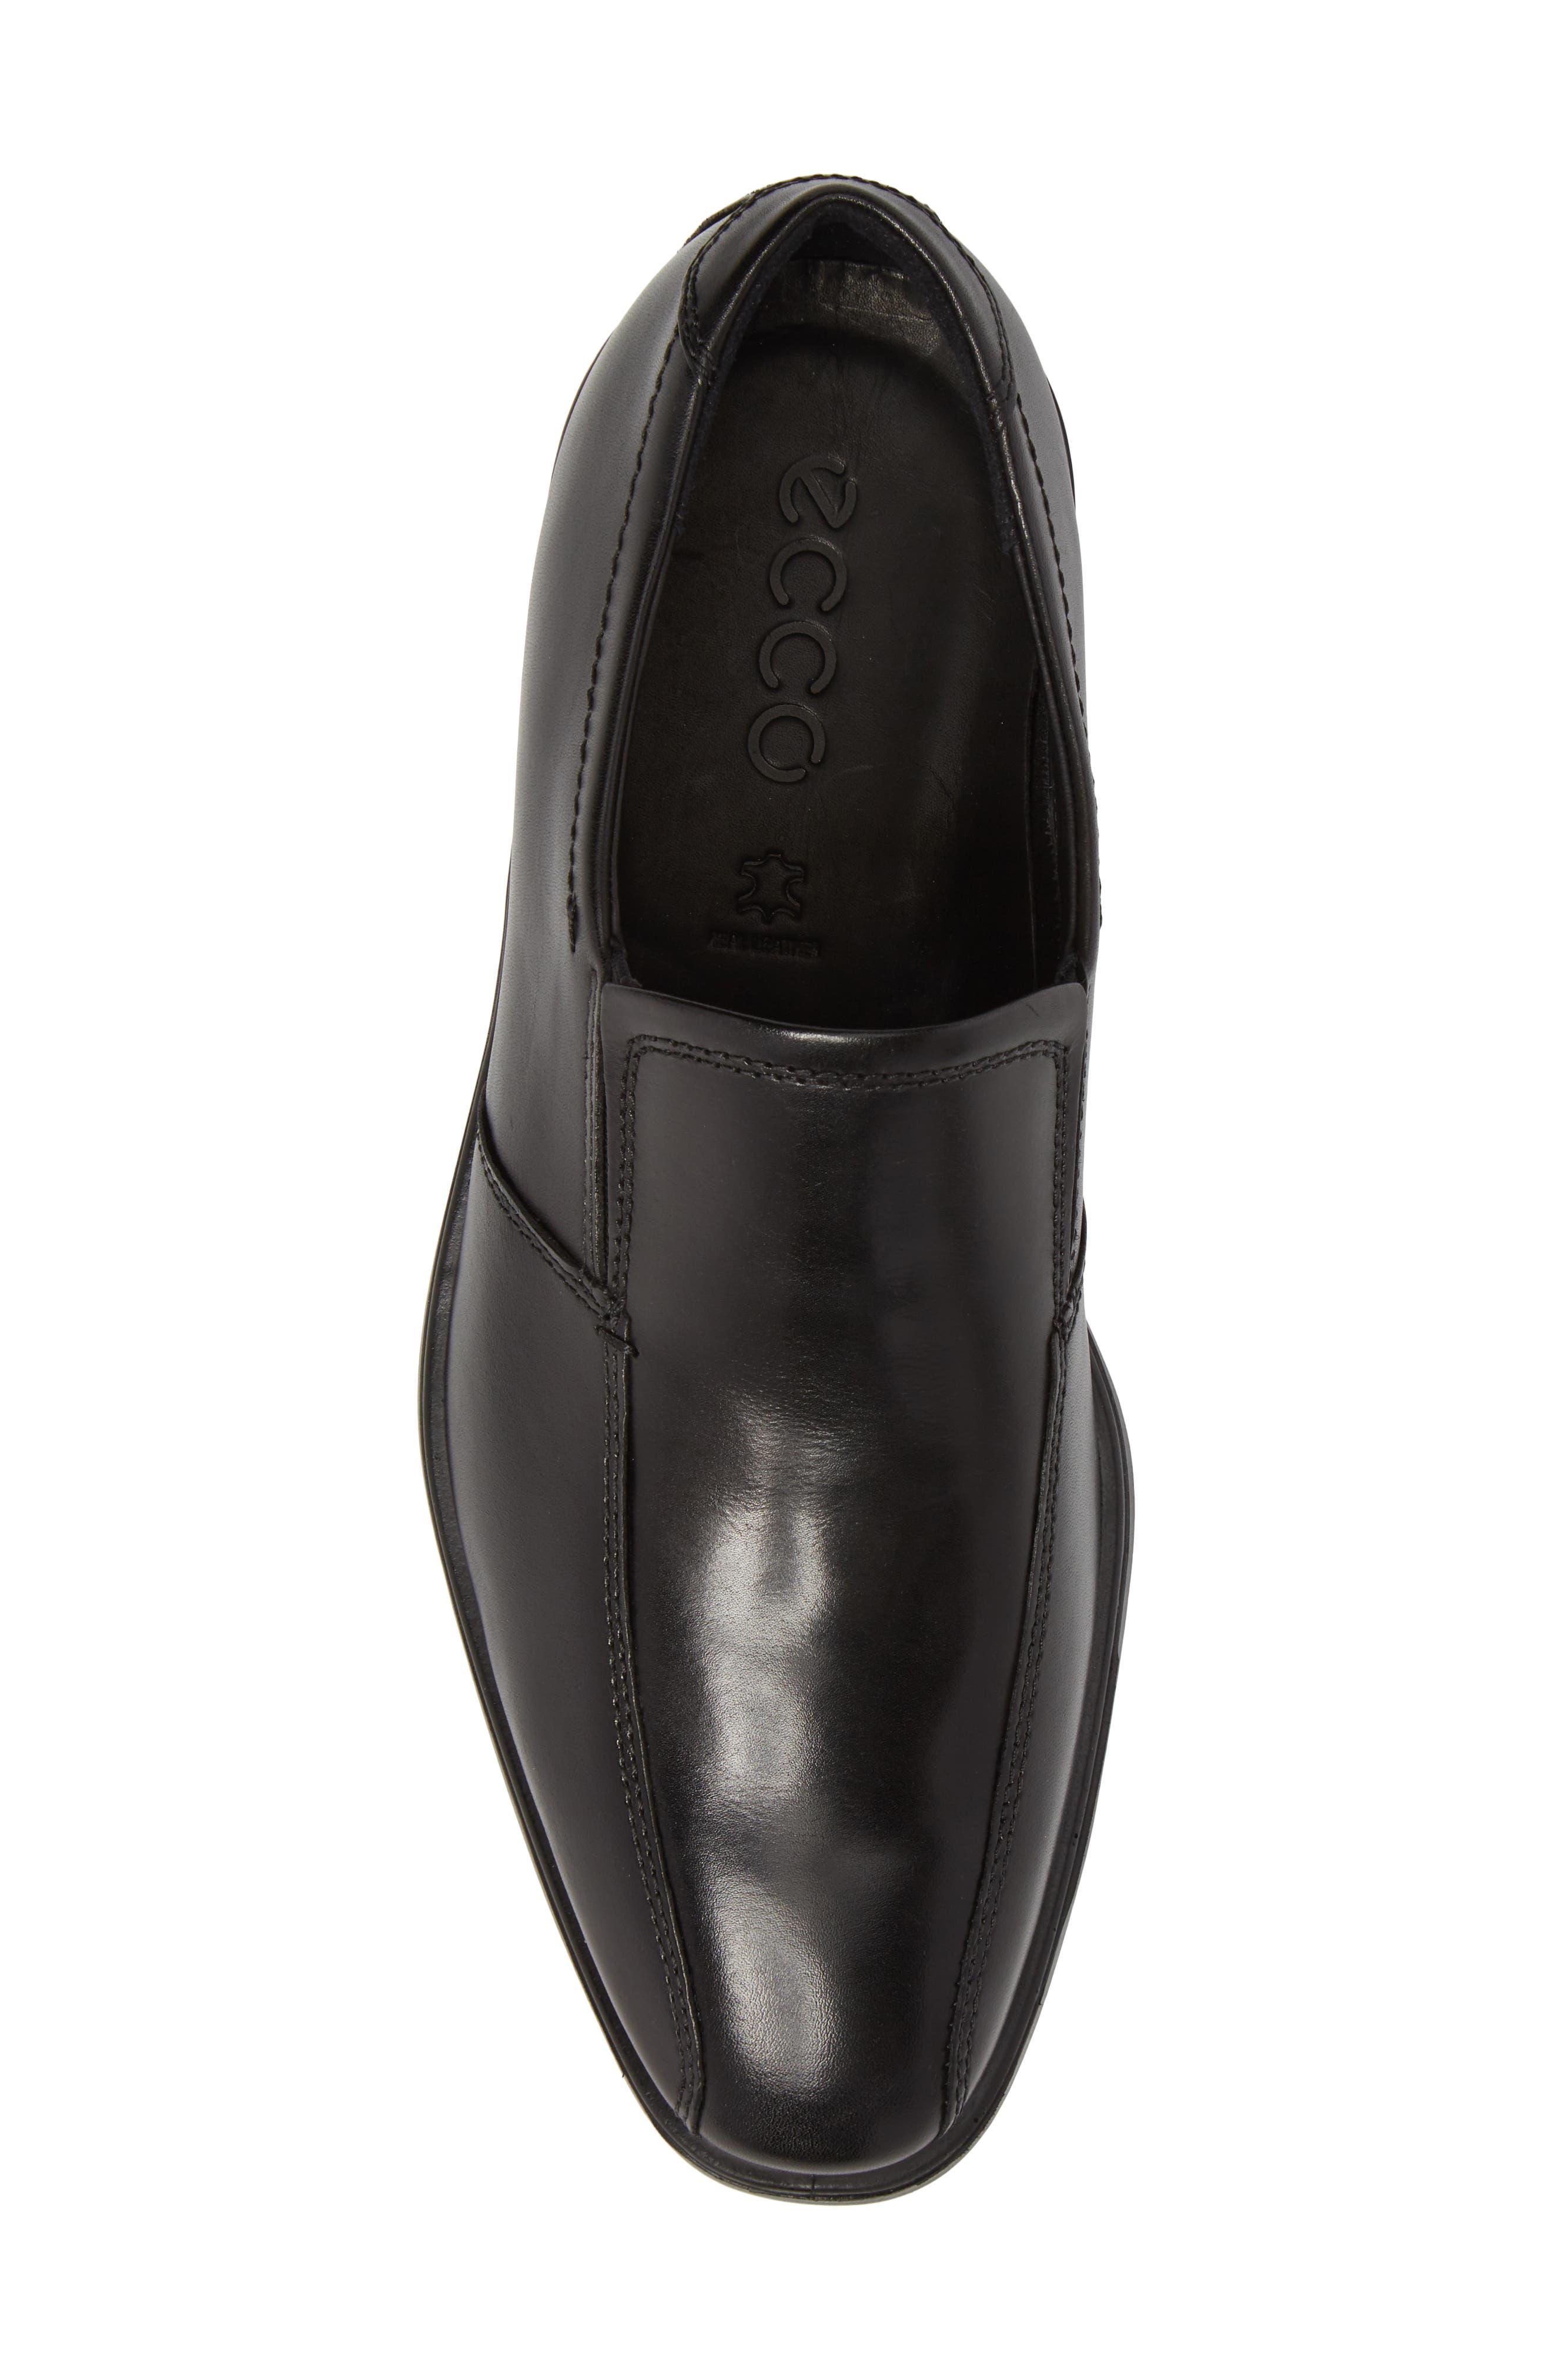 Melbourne Venetian Loafer,                             Alternate thumbnail 5, color,                             Black Leather